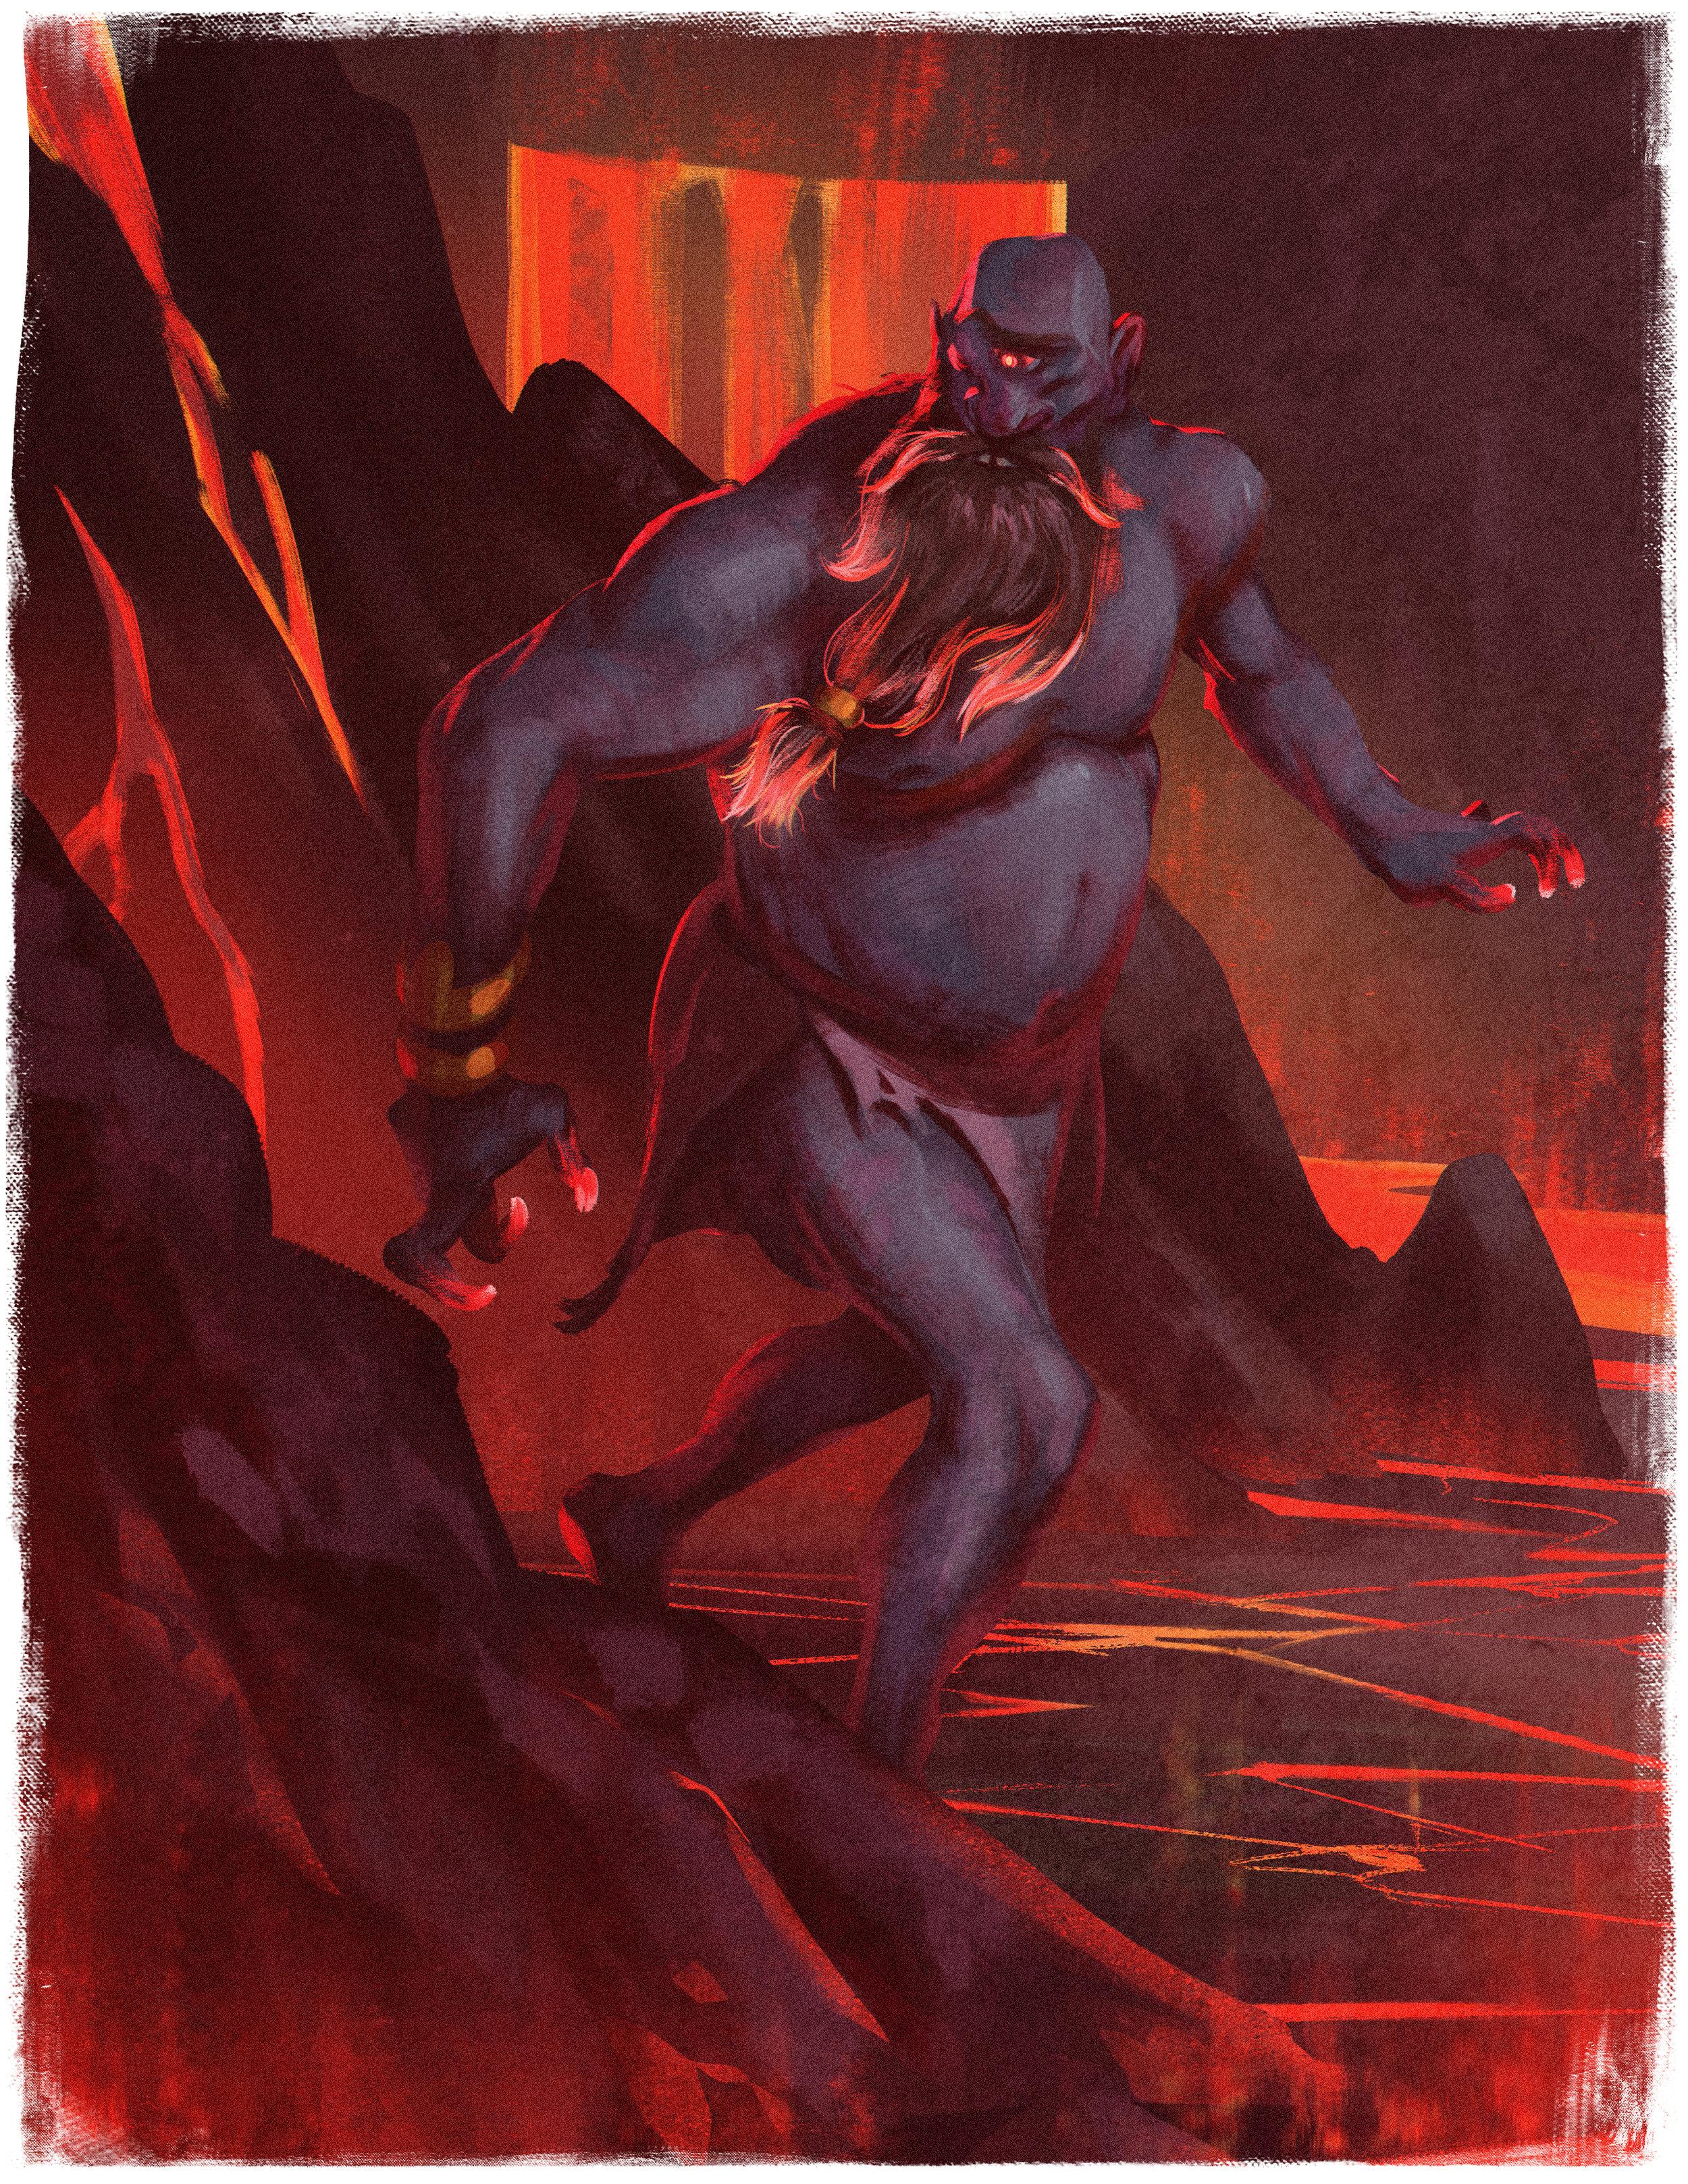 Cyclops_Illustration_01.jpg